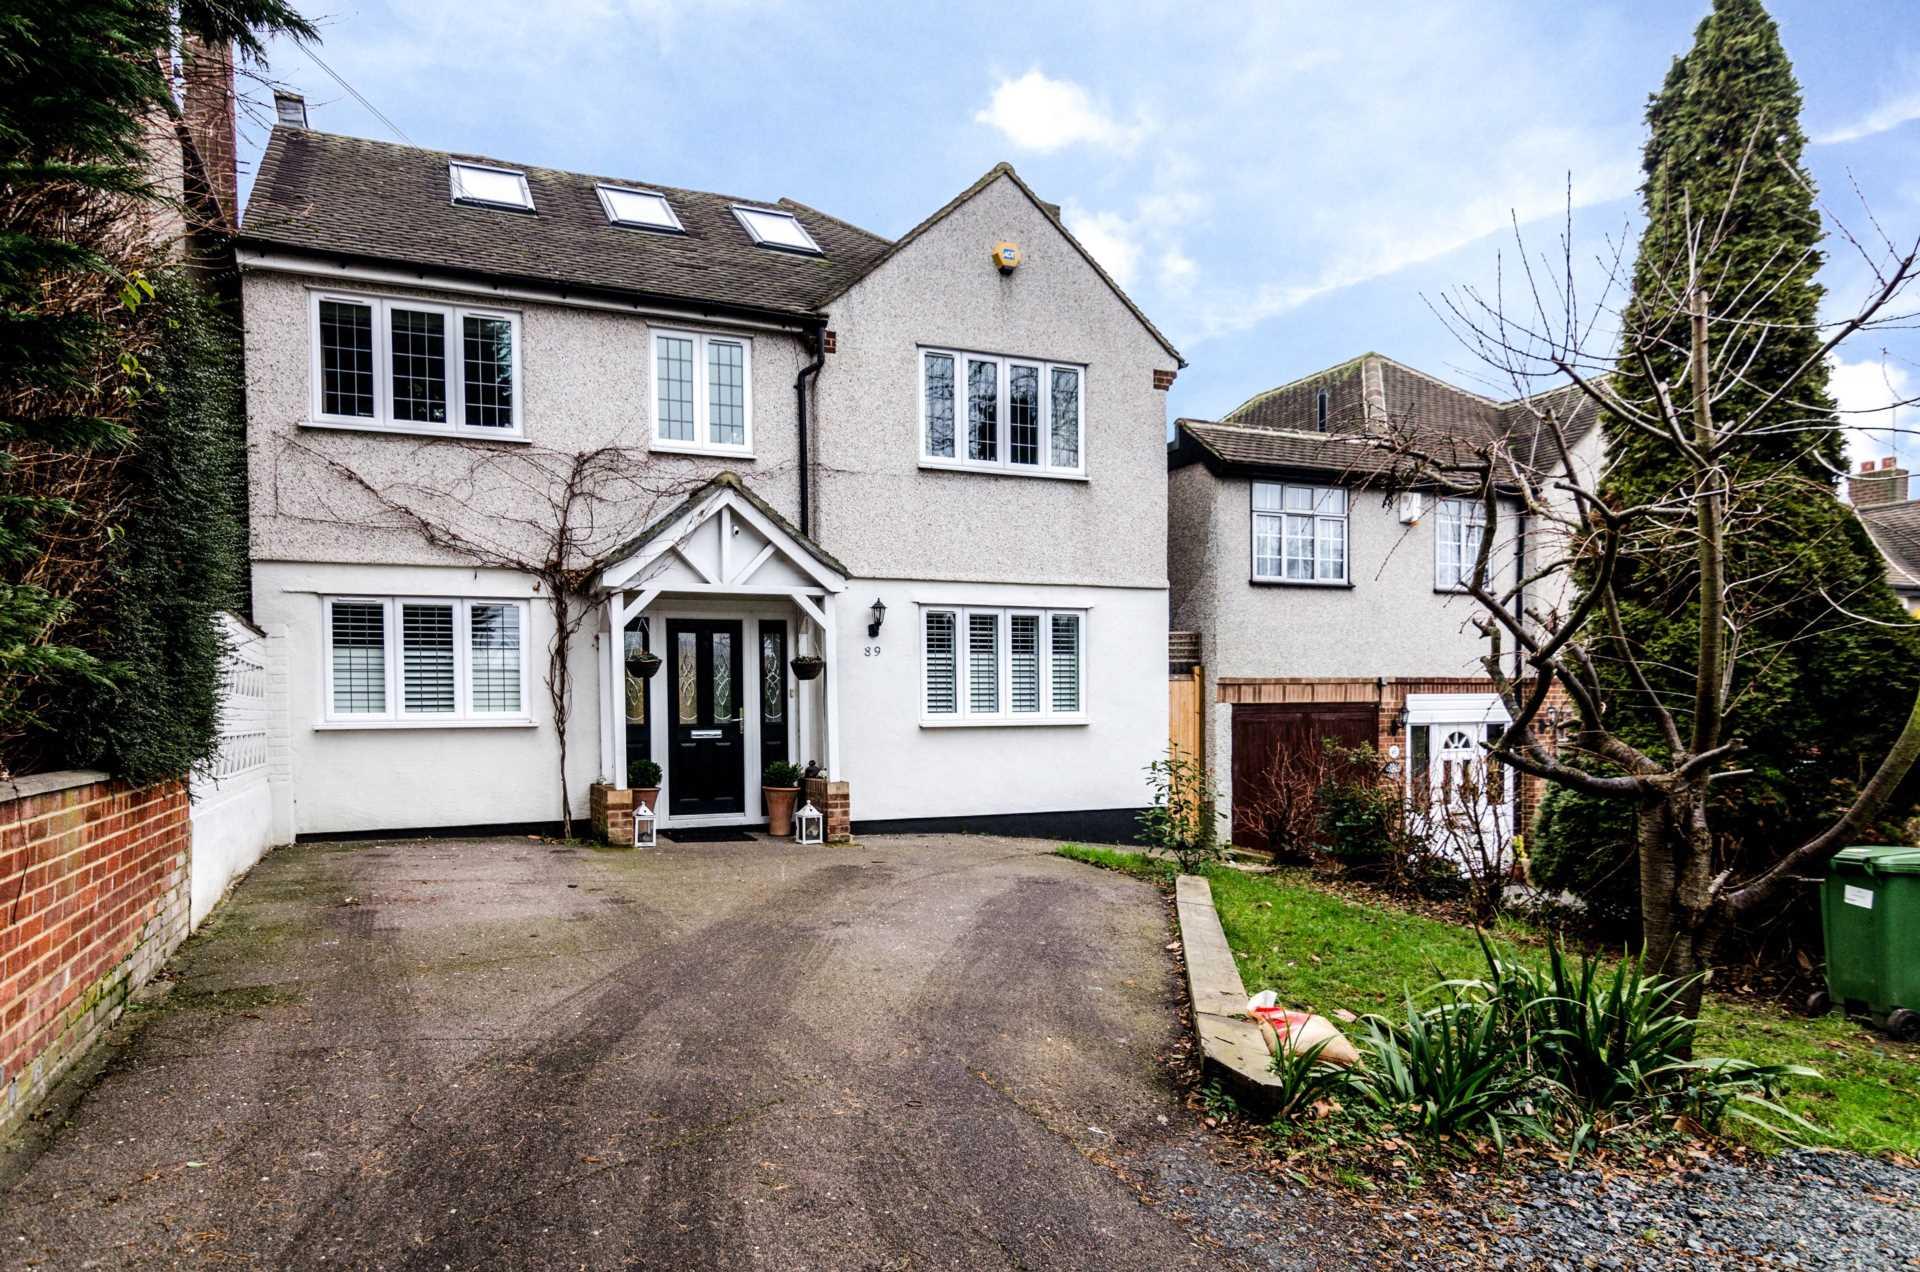 Property To Rent In Bexleyheath